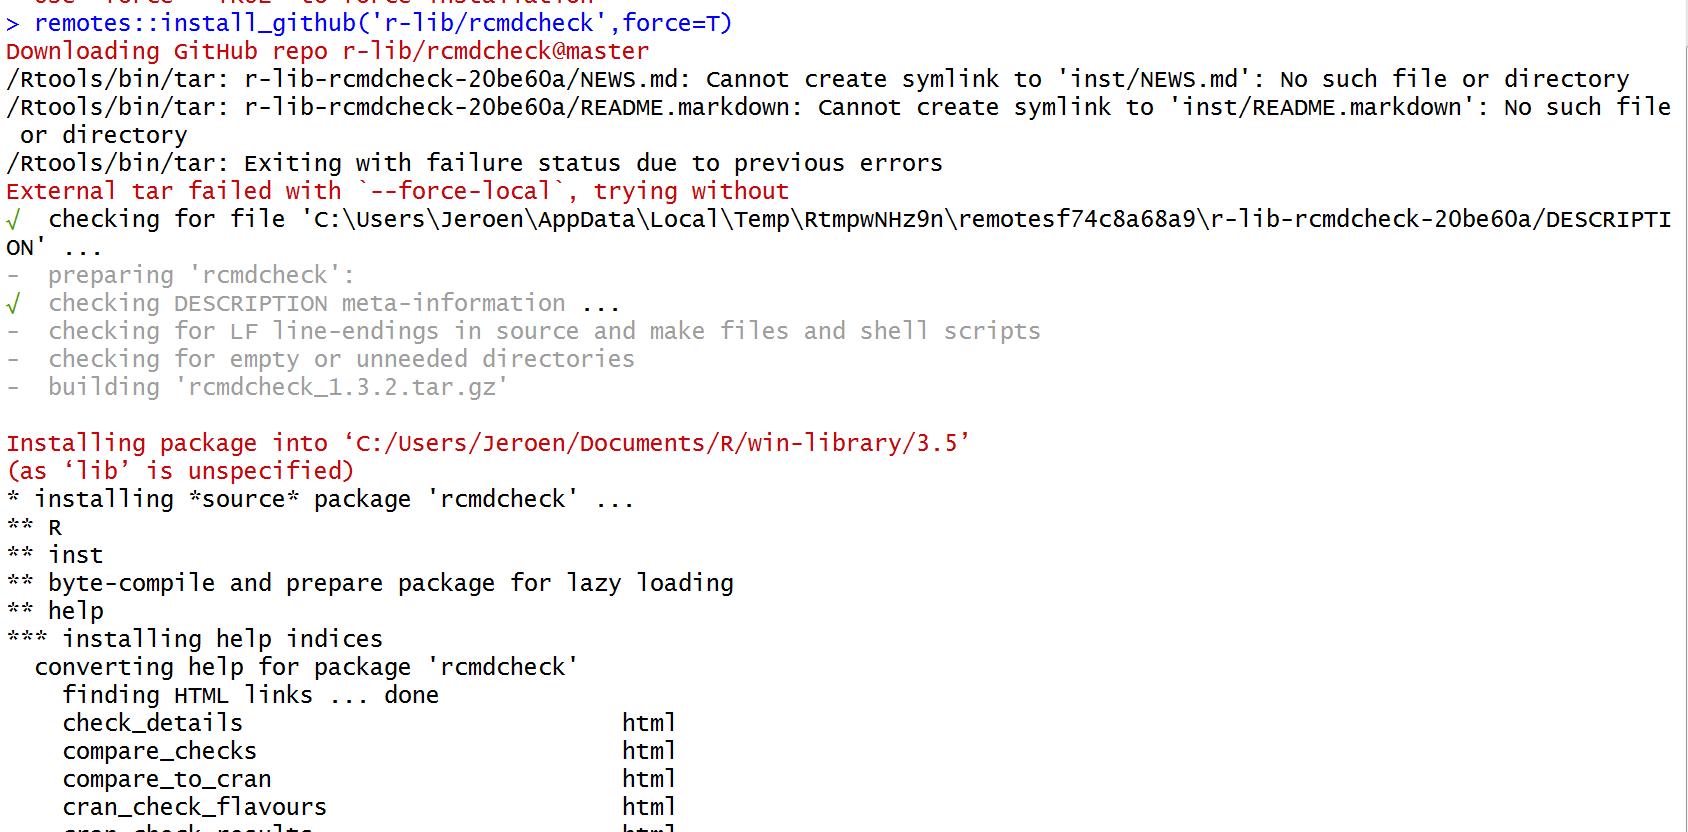 Windows: trouble finding tar/rtools · Issue #249 · r-lib